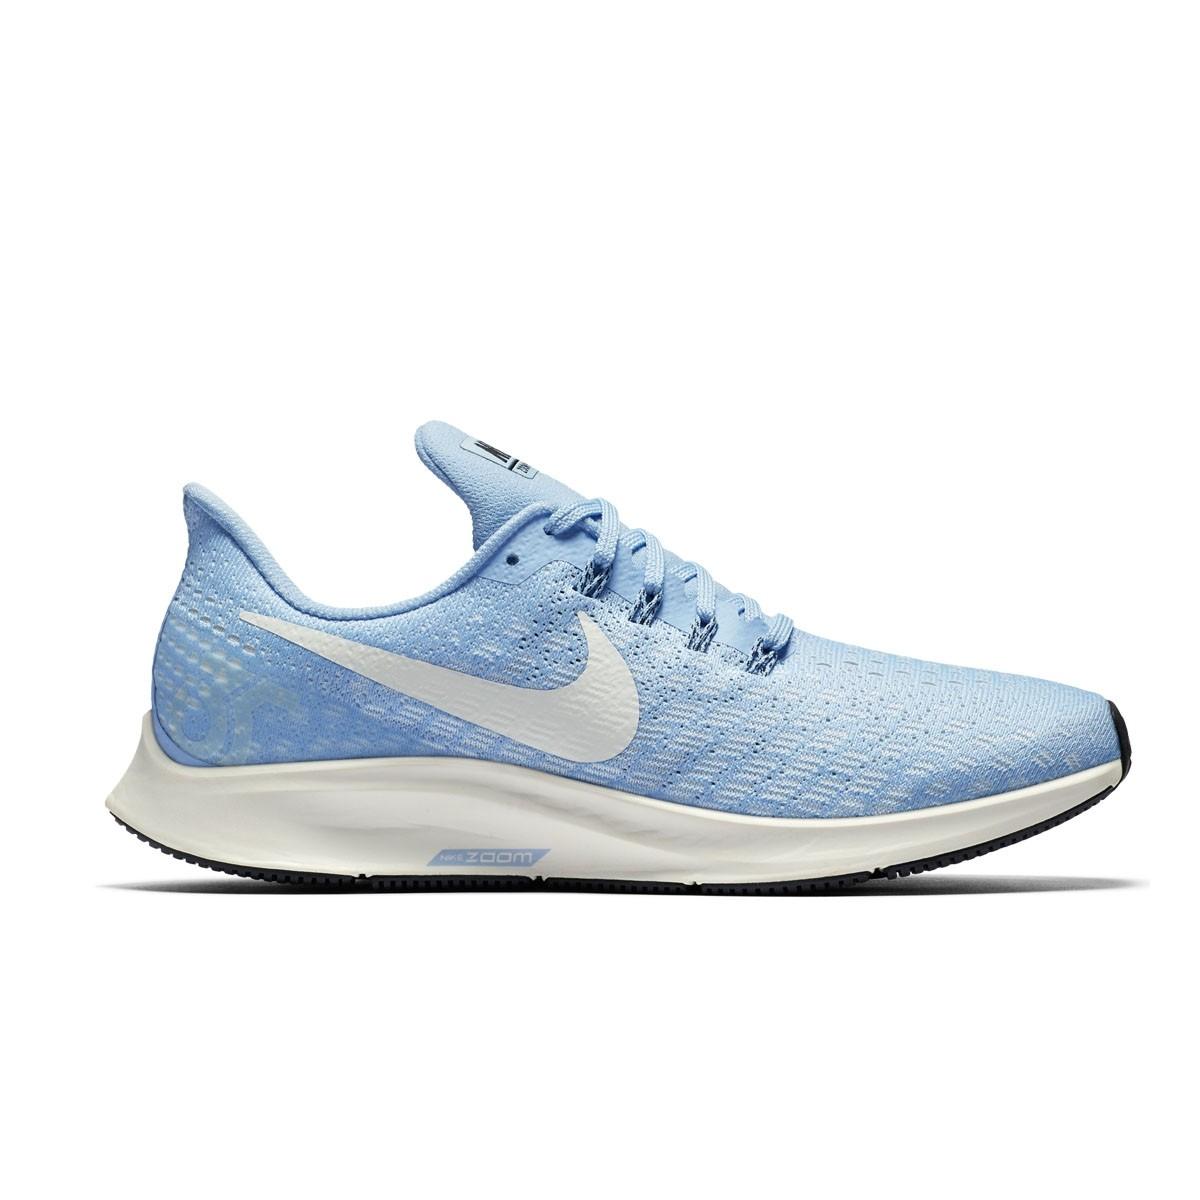 Nike Air Zoom Pegasus 35 Women's 'Blue Sky'